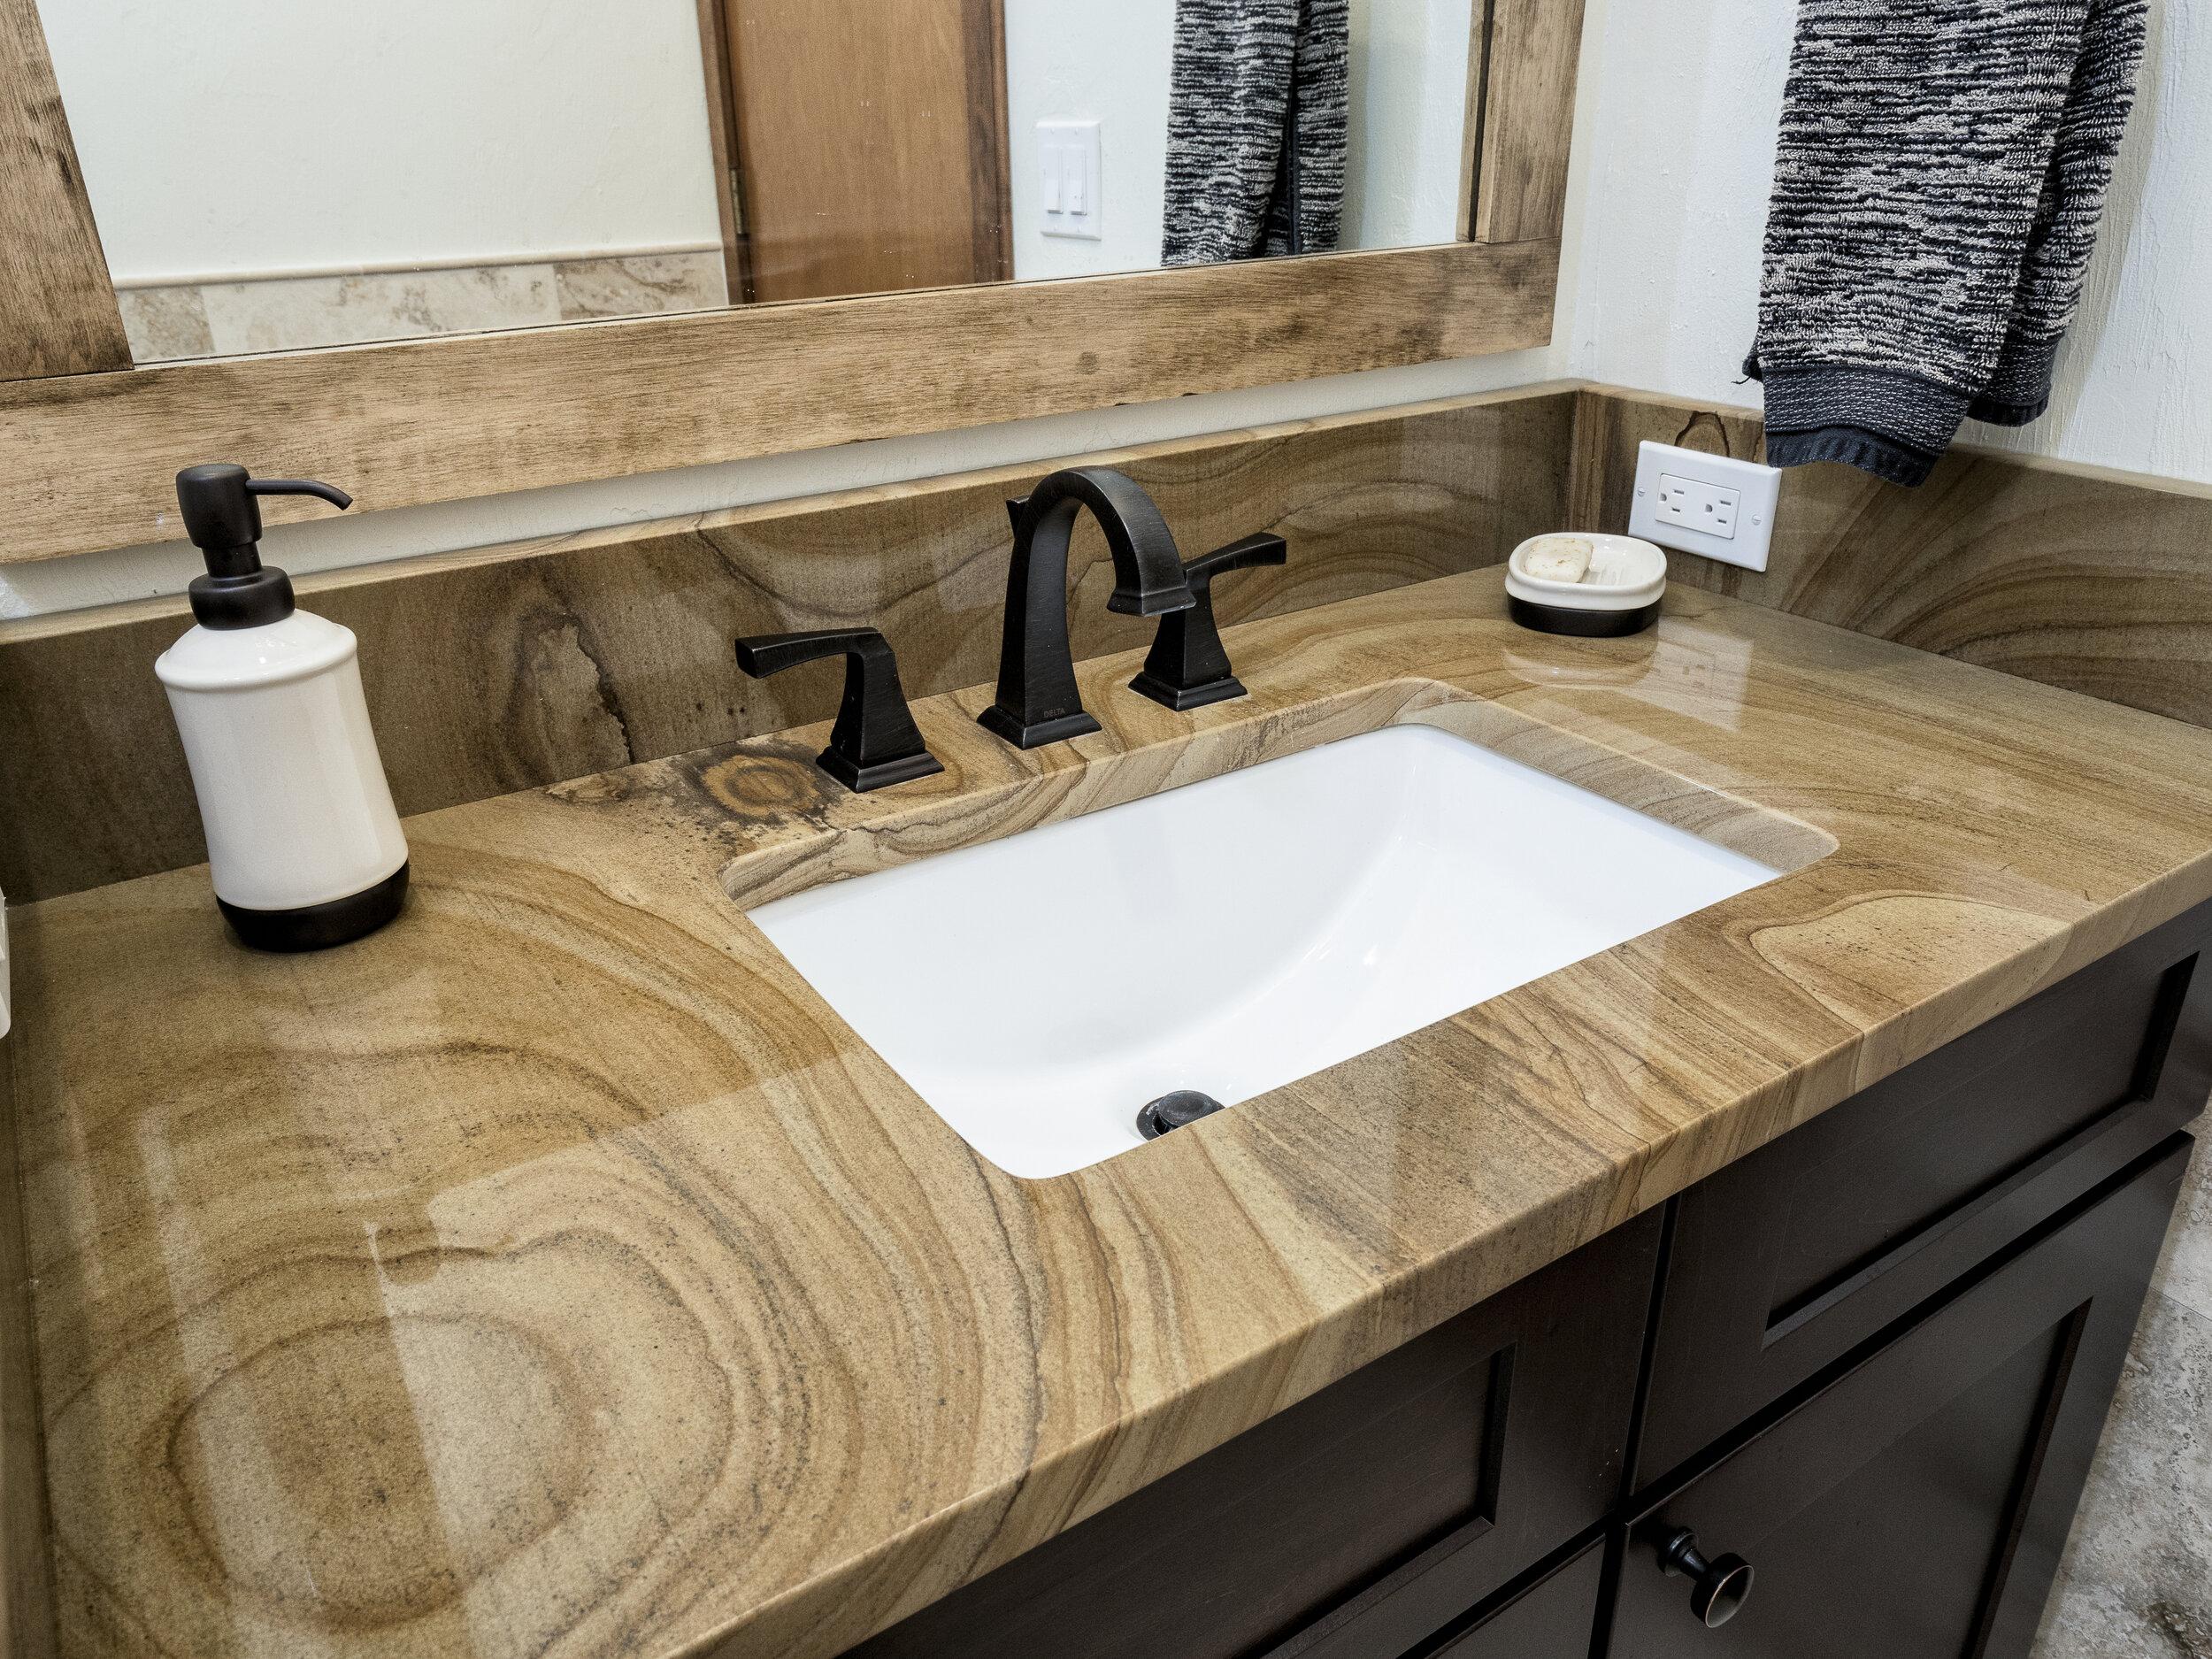 Davenport bath faucets 2.jpg